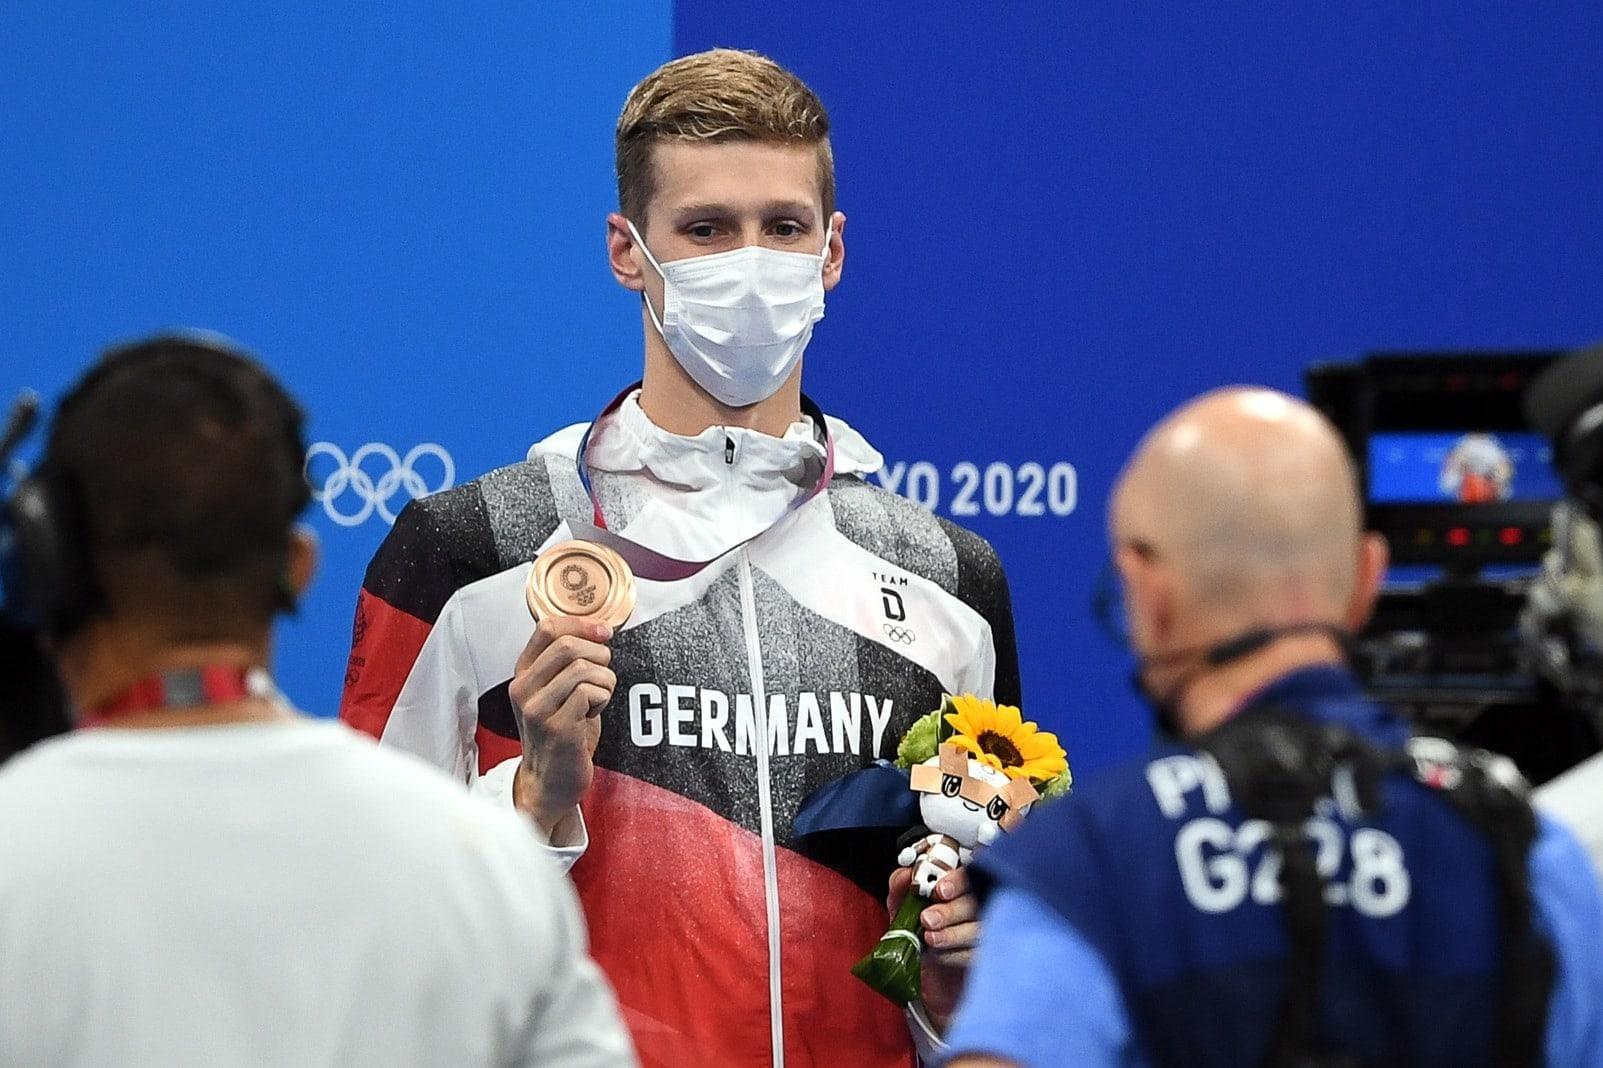 Florian Wellbrock Olympia Bronze